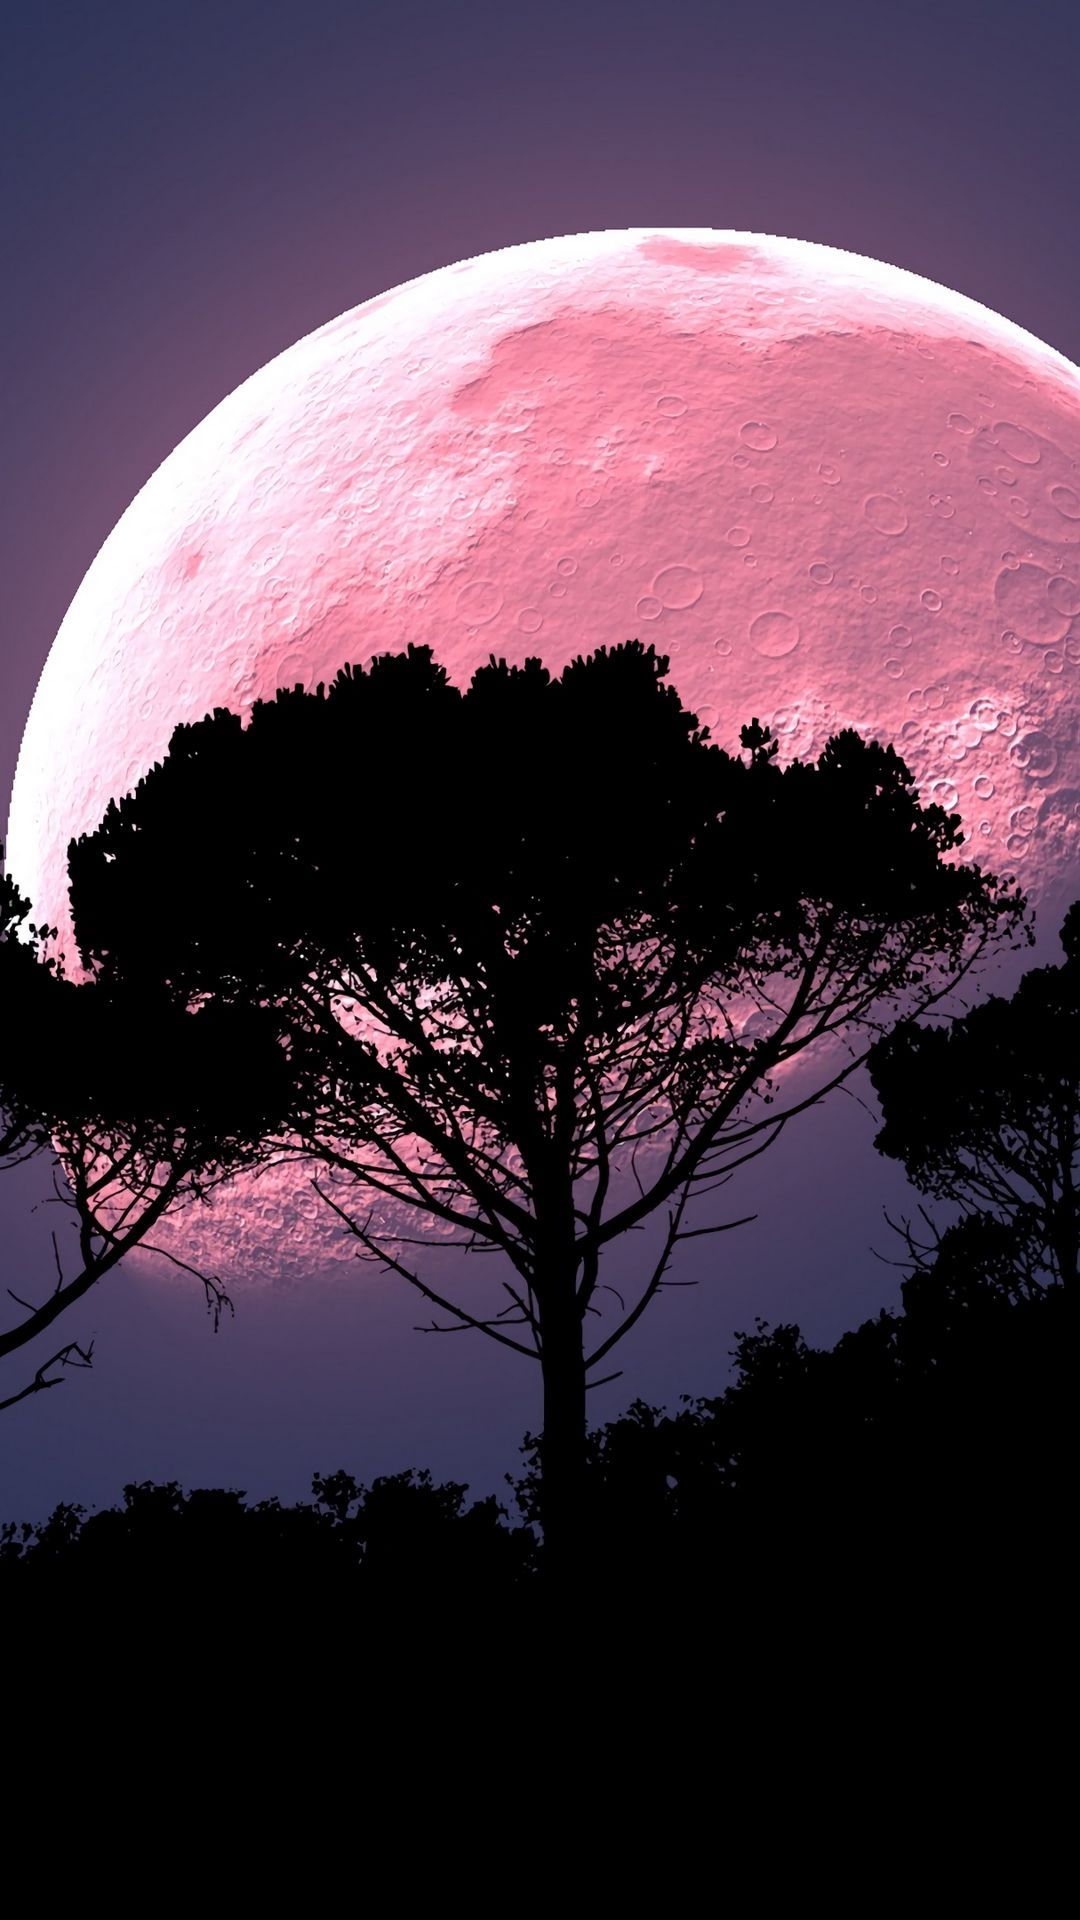 Download wallpaper 1080x1920 moon, tree, photoshop, night, full moon, planet samsung galaxy s4, s5, note, sony xperia z, z1, z2, z3, htc one, lenovo vibe hd background